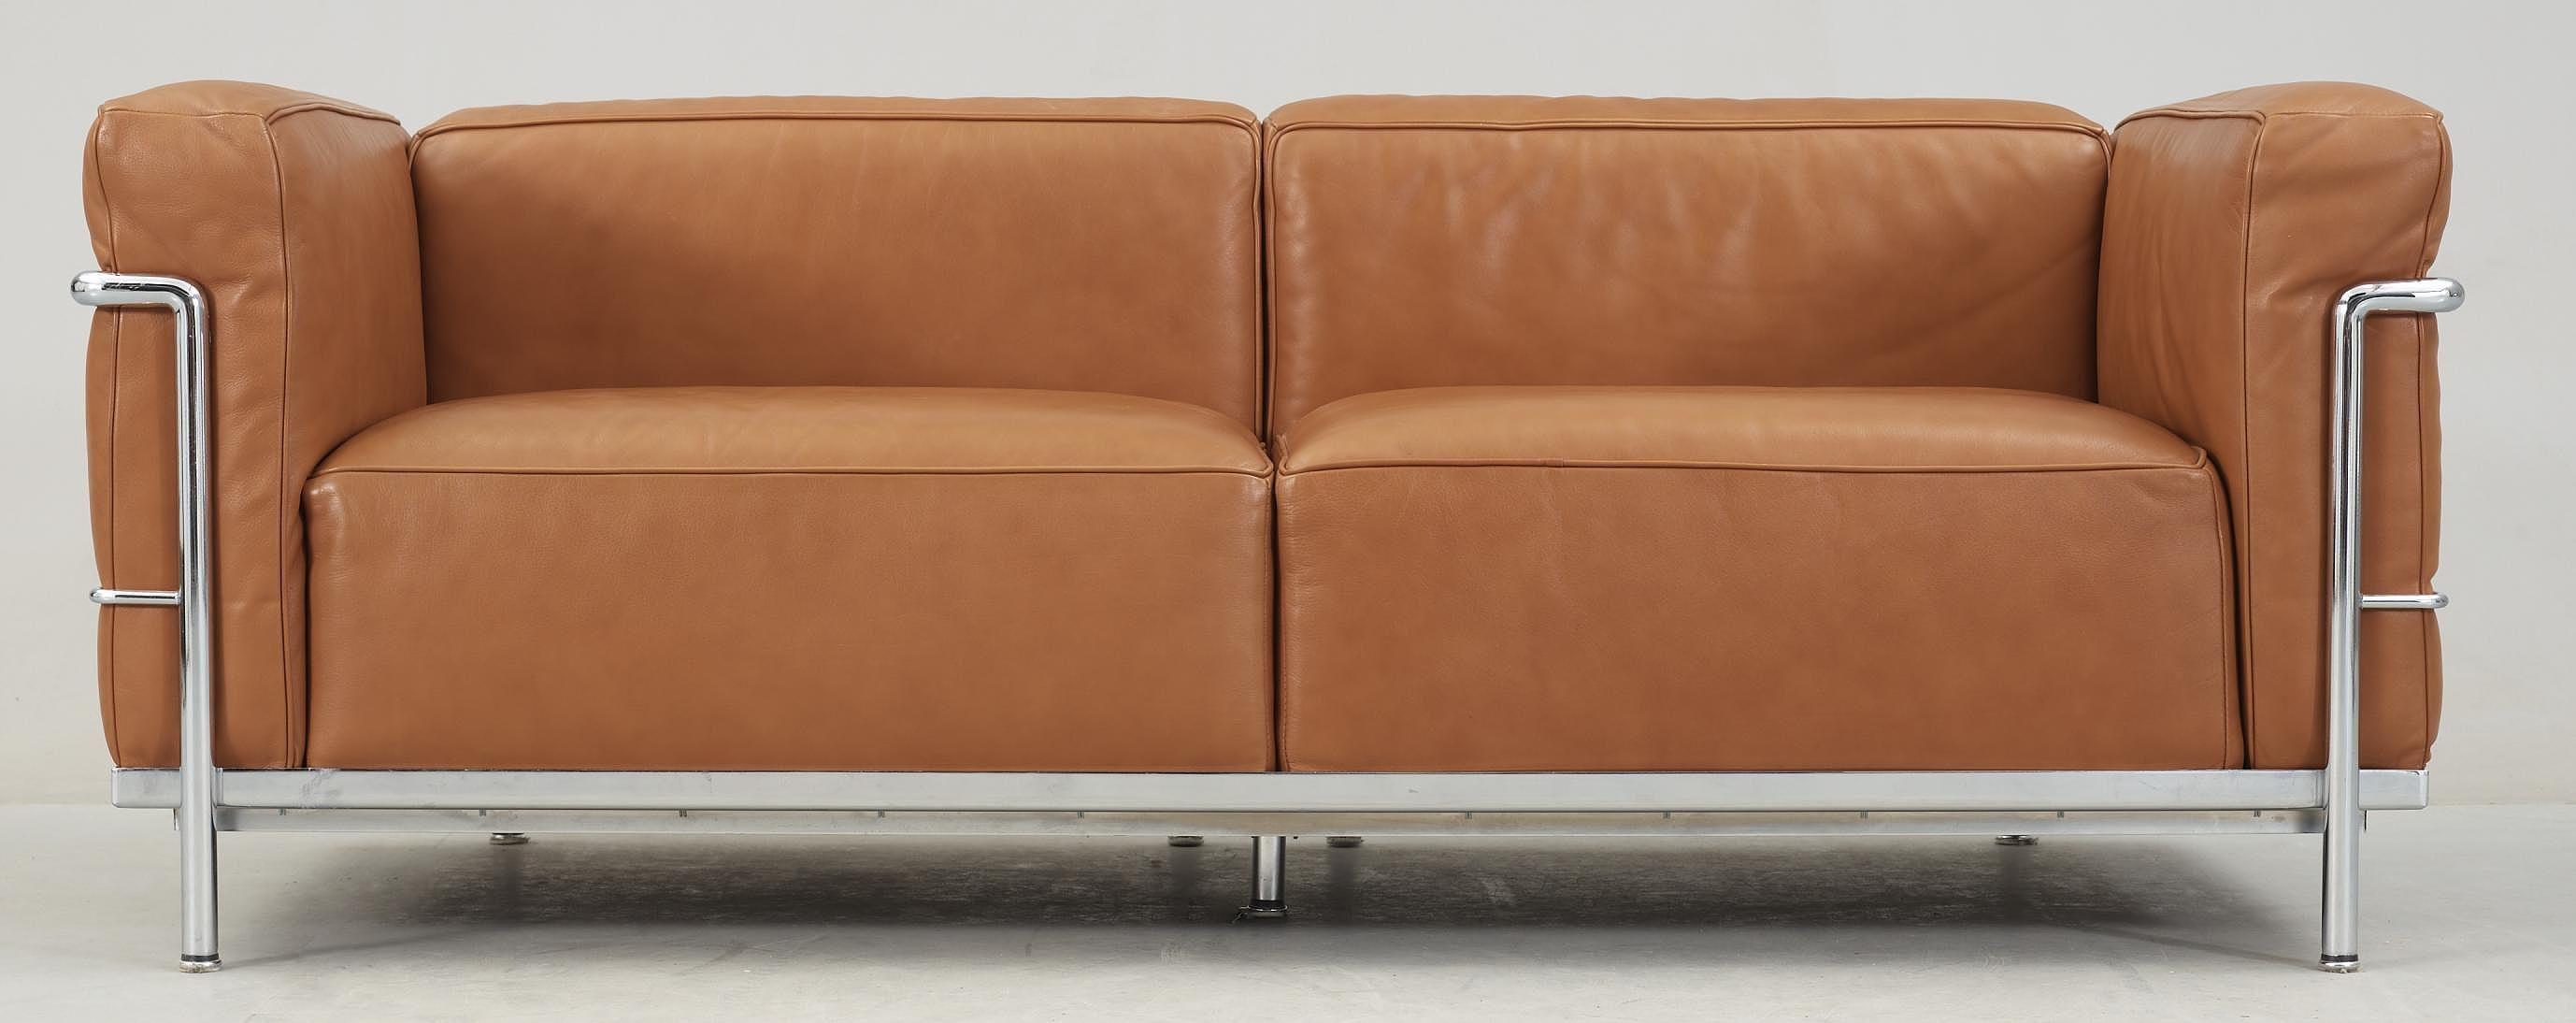 Sofa Le Corbusier Lc 3 Marked Cassina Cognac Colored Leather